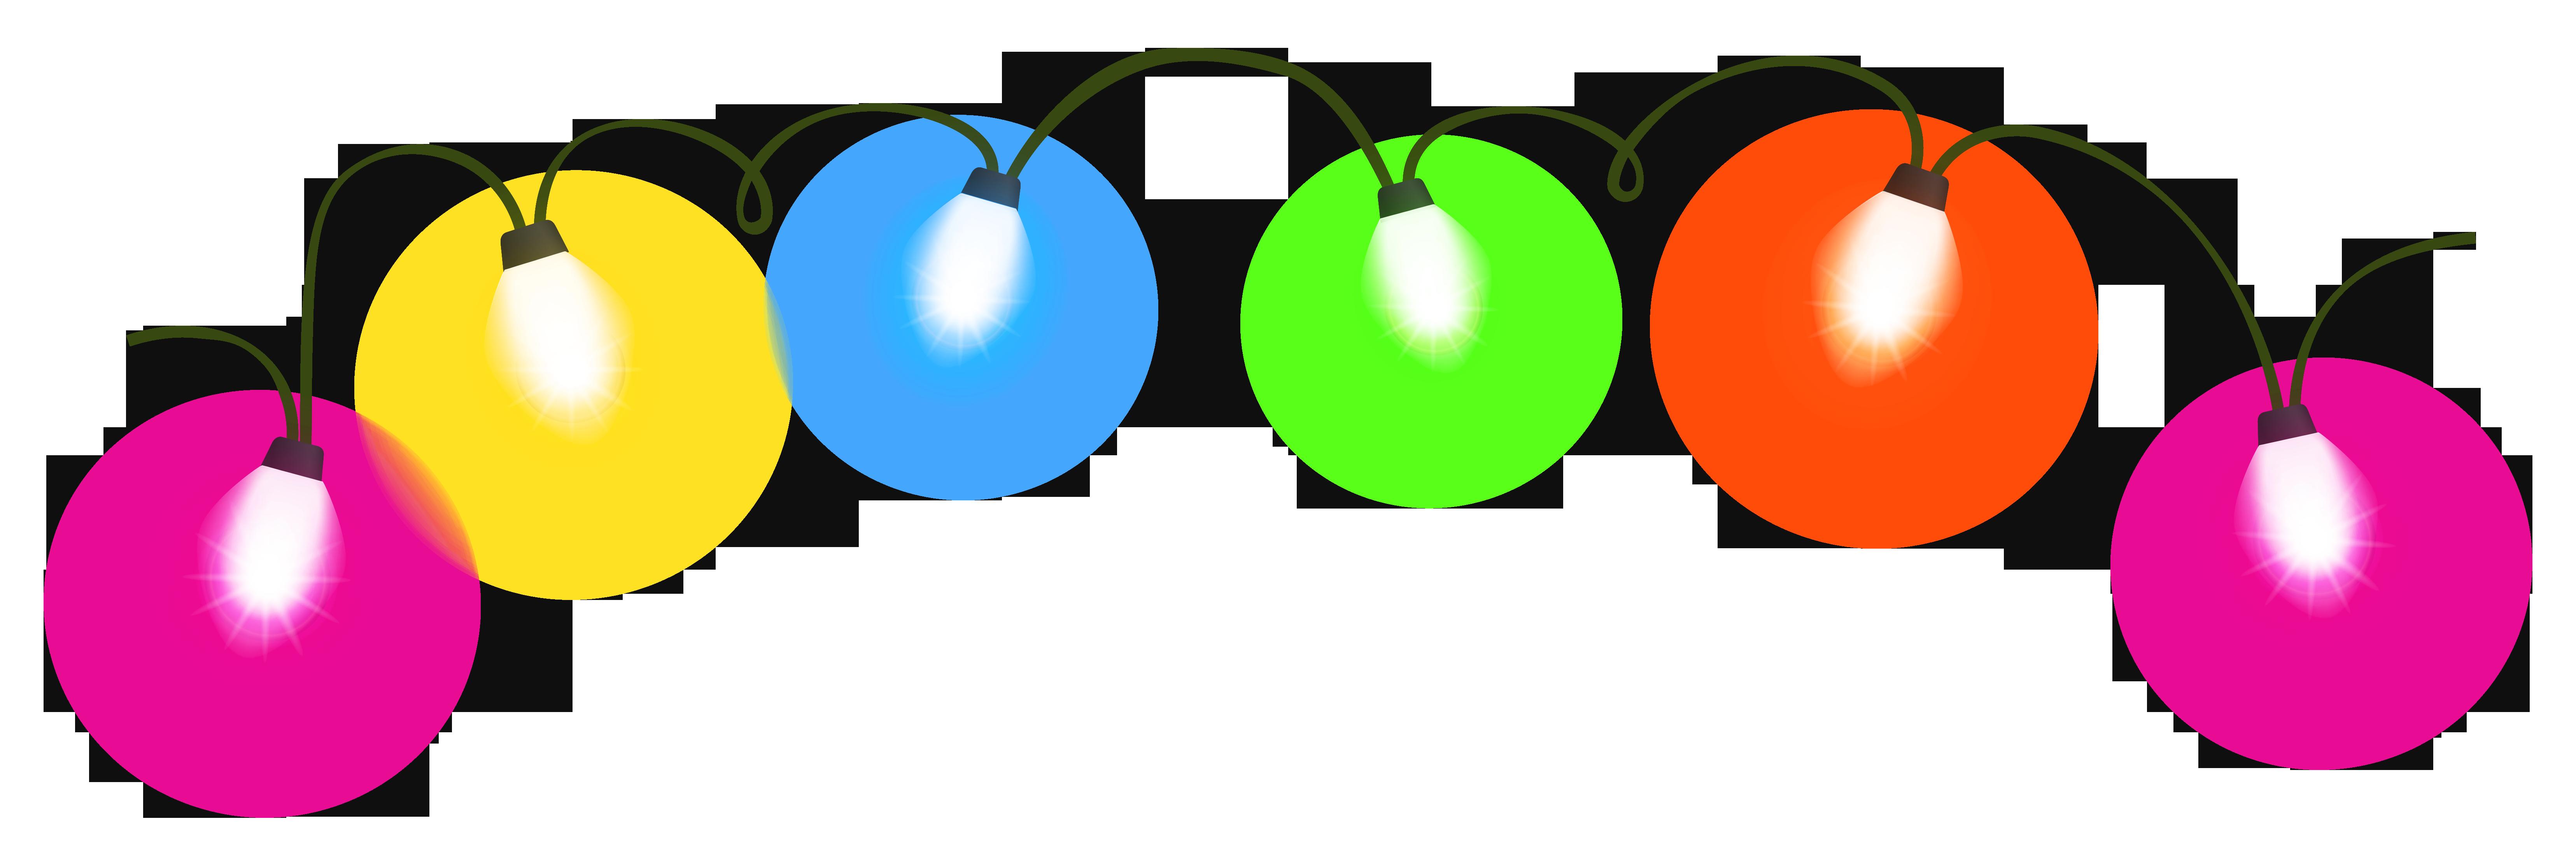 Christmas lights Lighting Animation Clip art.